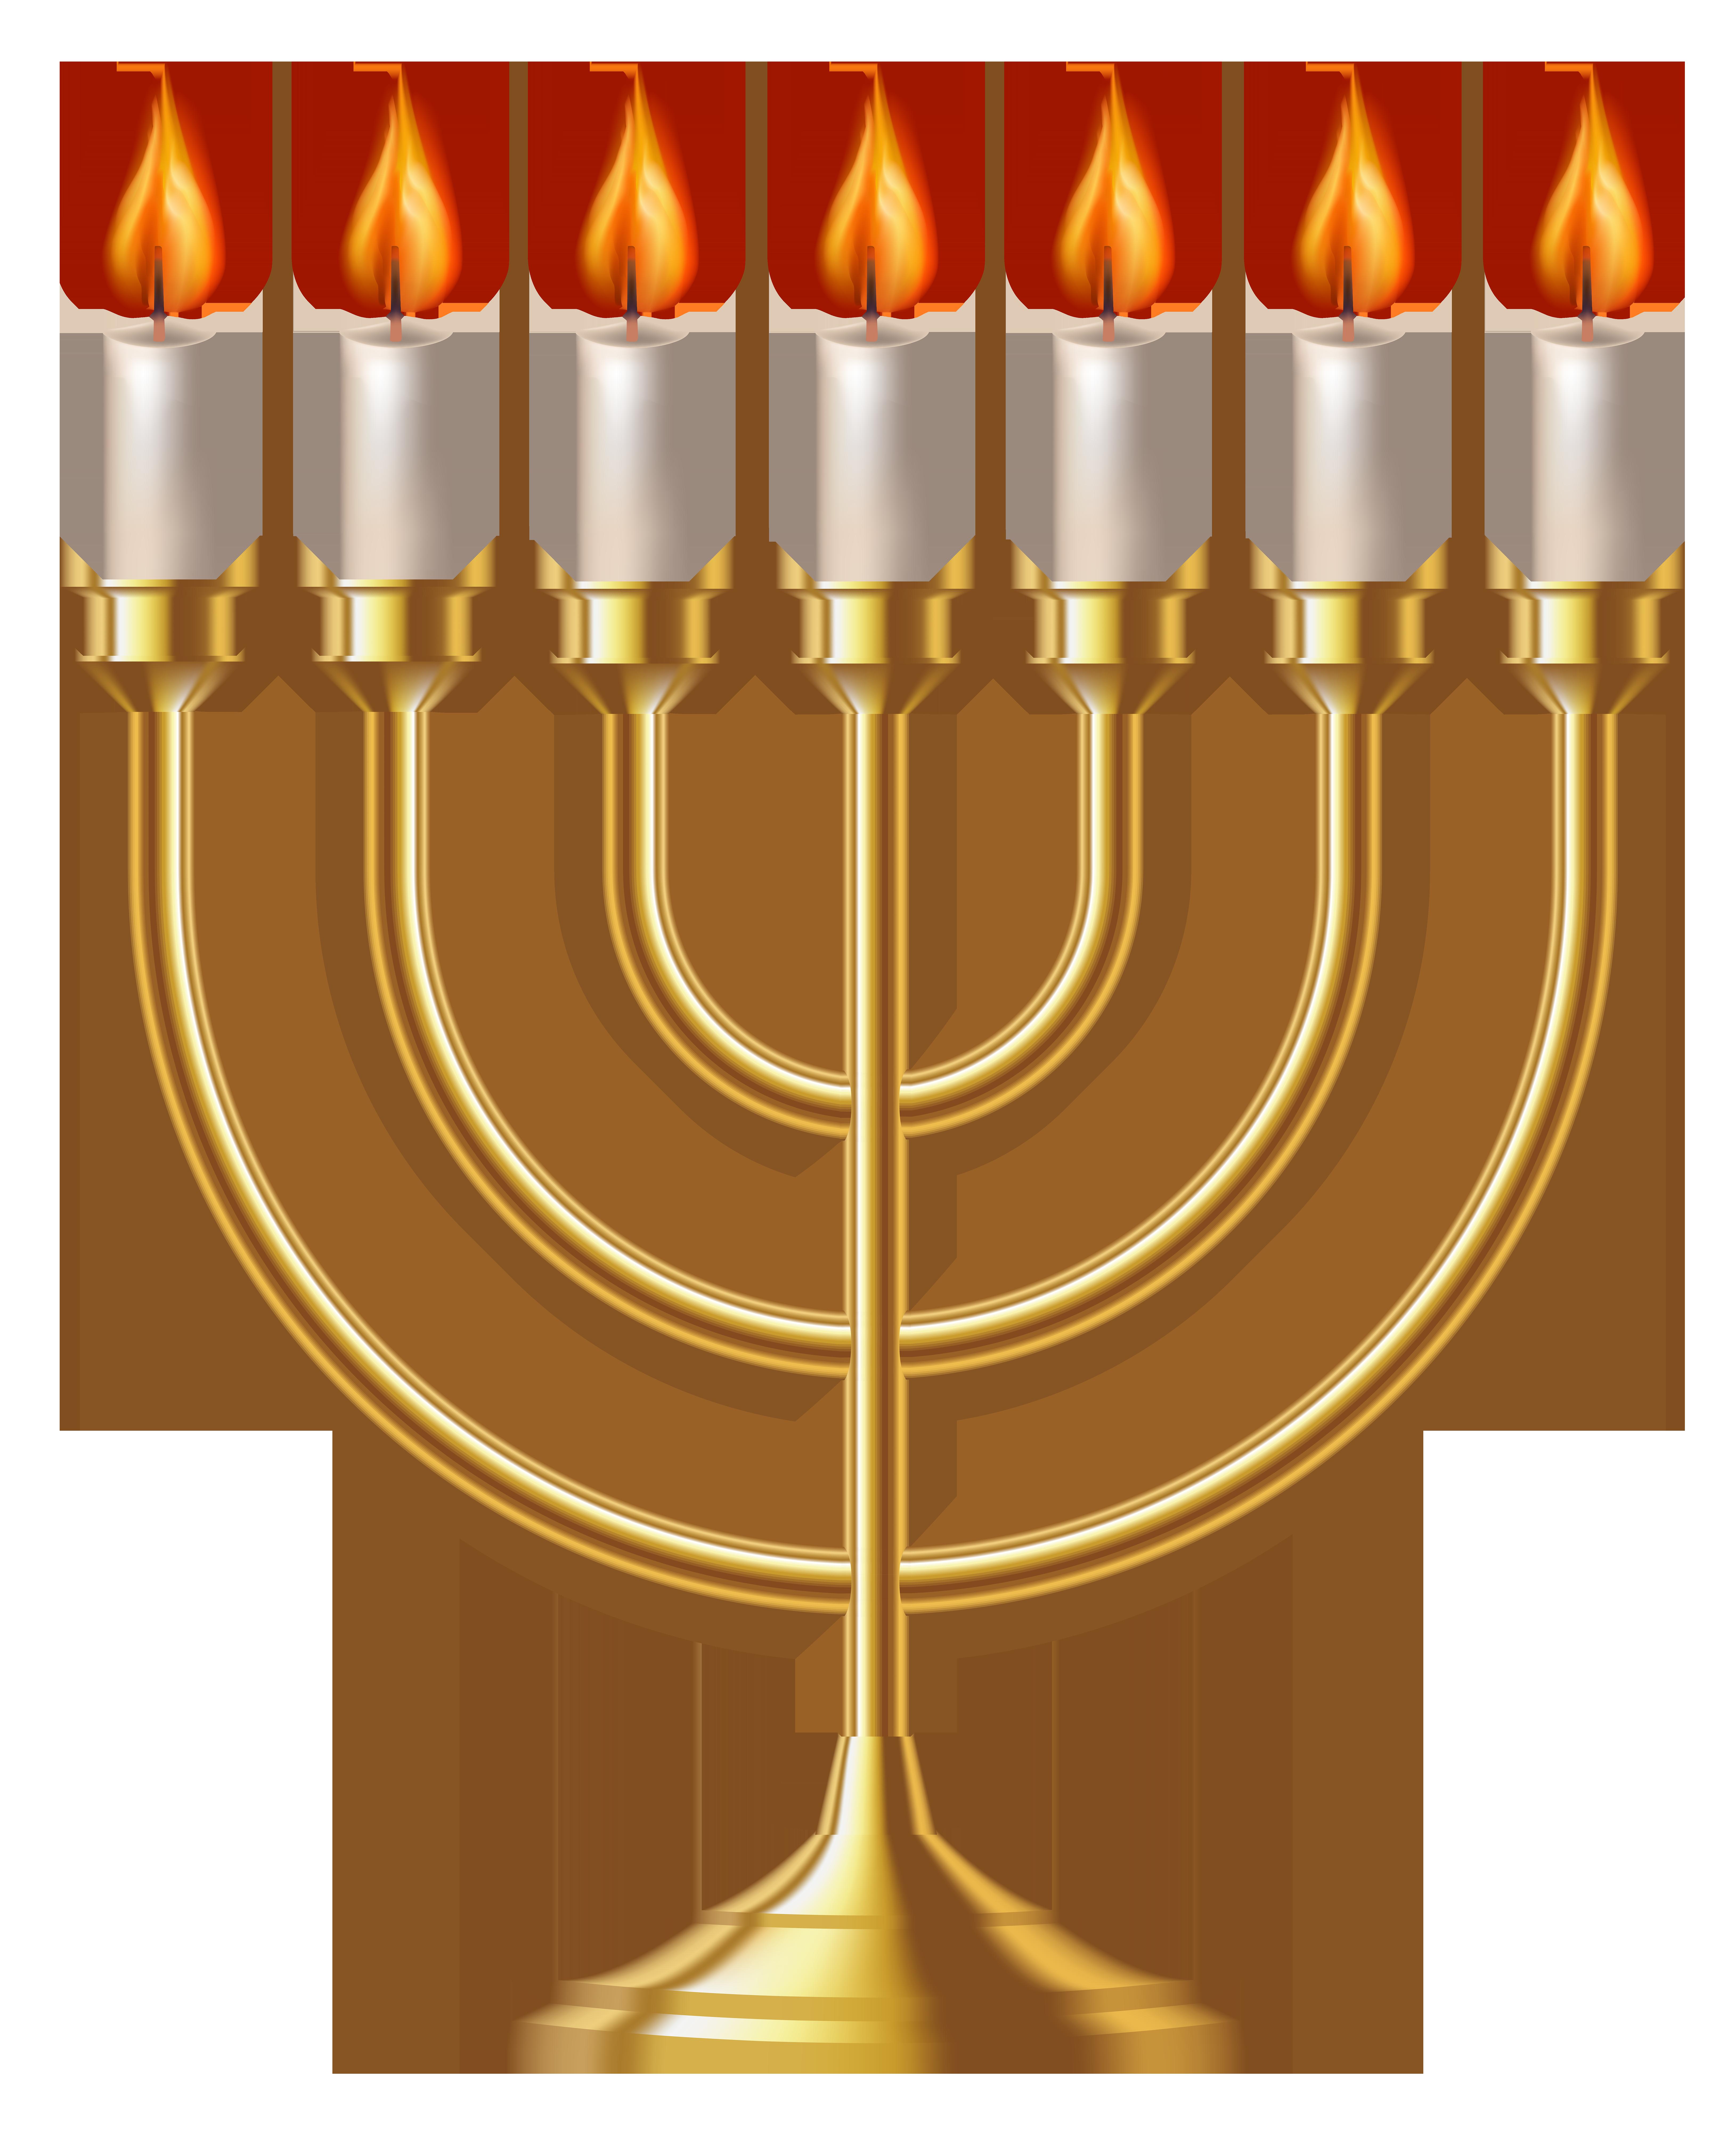 Candle clipart candlestick. Png clip art best